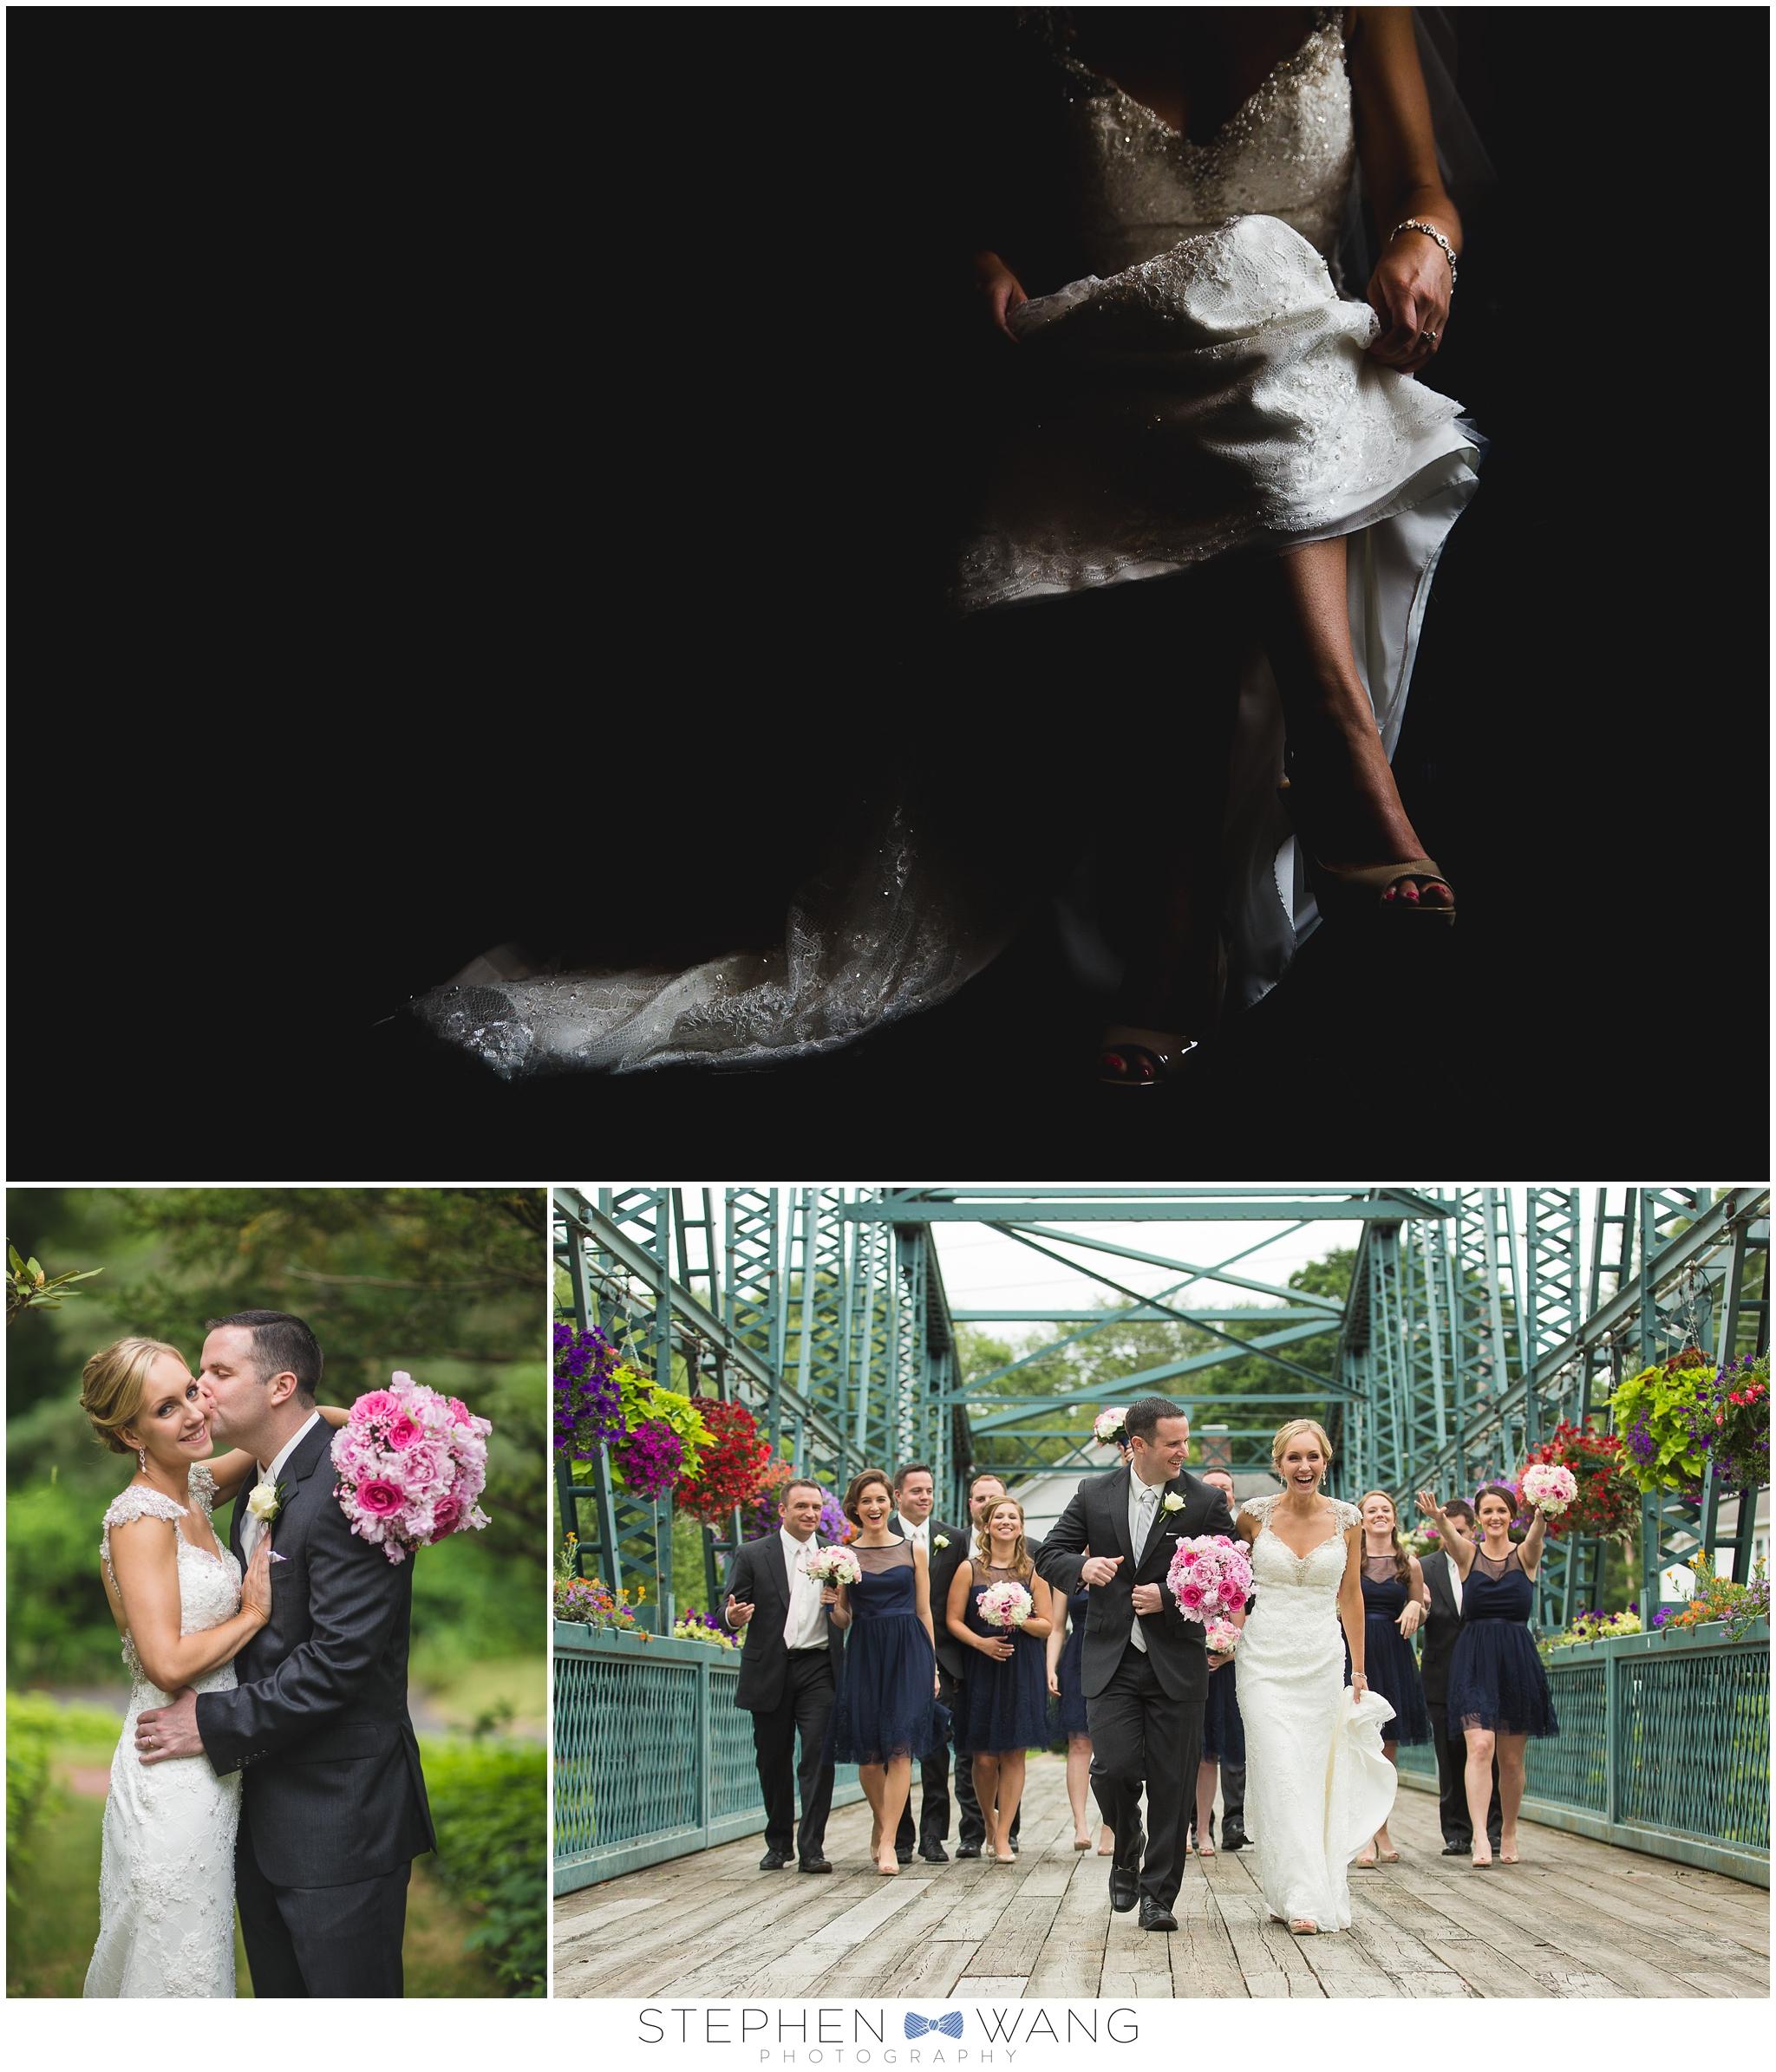 Stephen Wang Photography Wedding Photographer Connecticut CT-12-24_0002.jpg